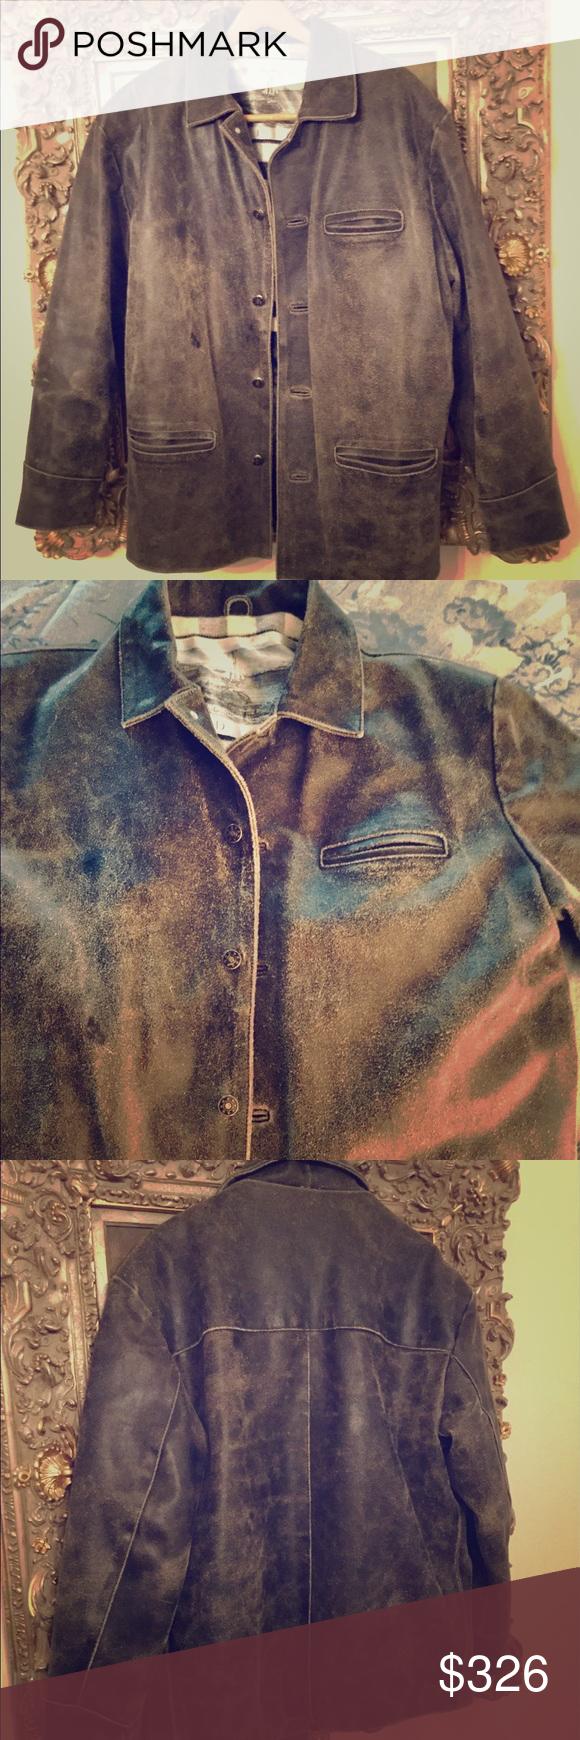 Vintage Very Rare Men S Hudson Leather Jacket This Is A Very Rare Men S Vintage Hudson Distres Distressed Leather Jacket Vintage Leather Jacket Leather Jacket [ 1740 x 580 Pixel ]